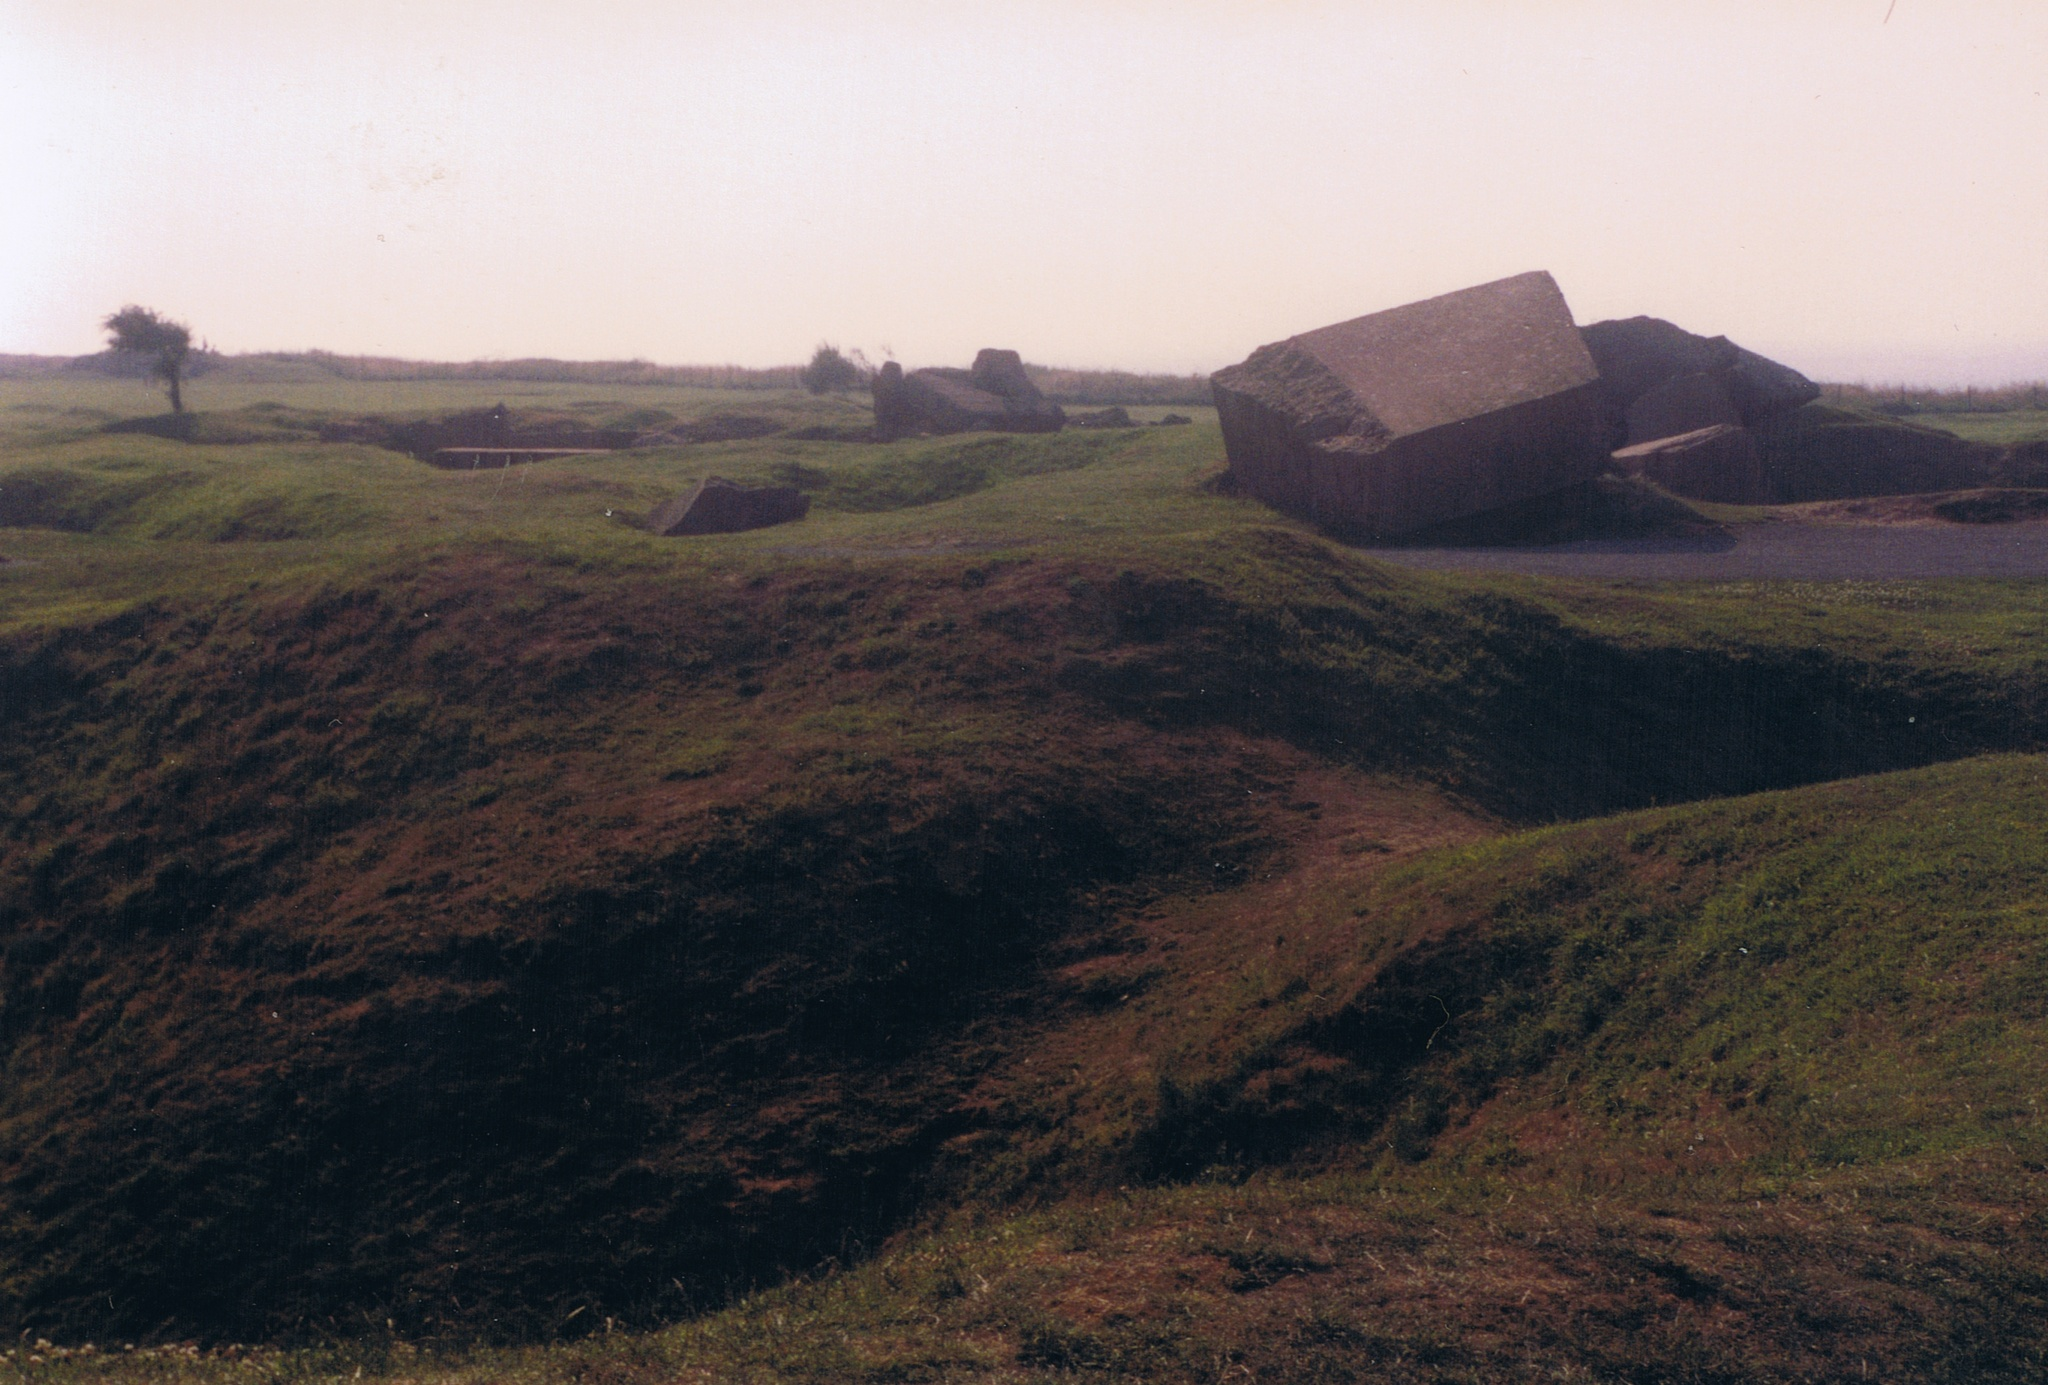 Battlefield of Pointe du Hoc,  Normandy by Milore